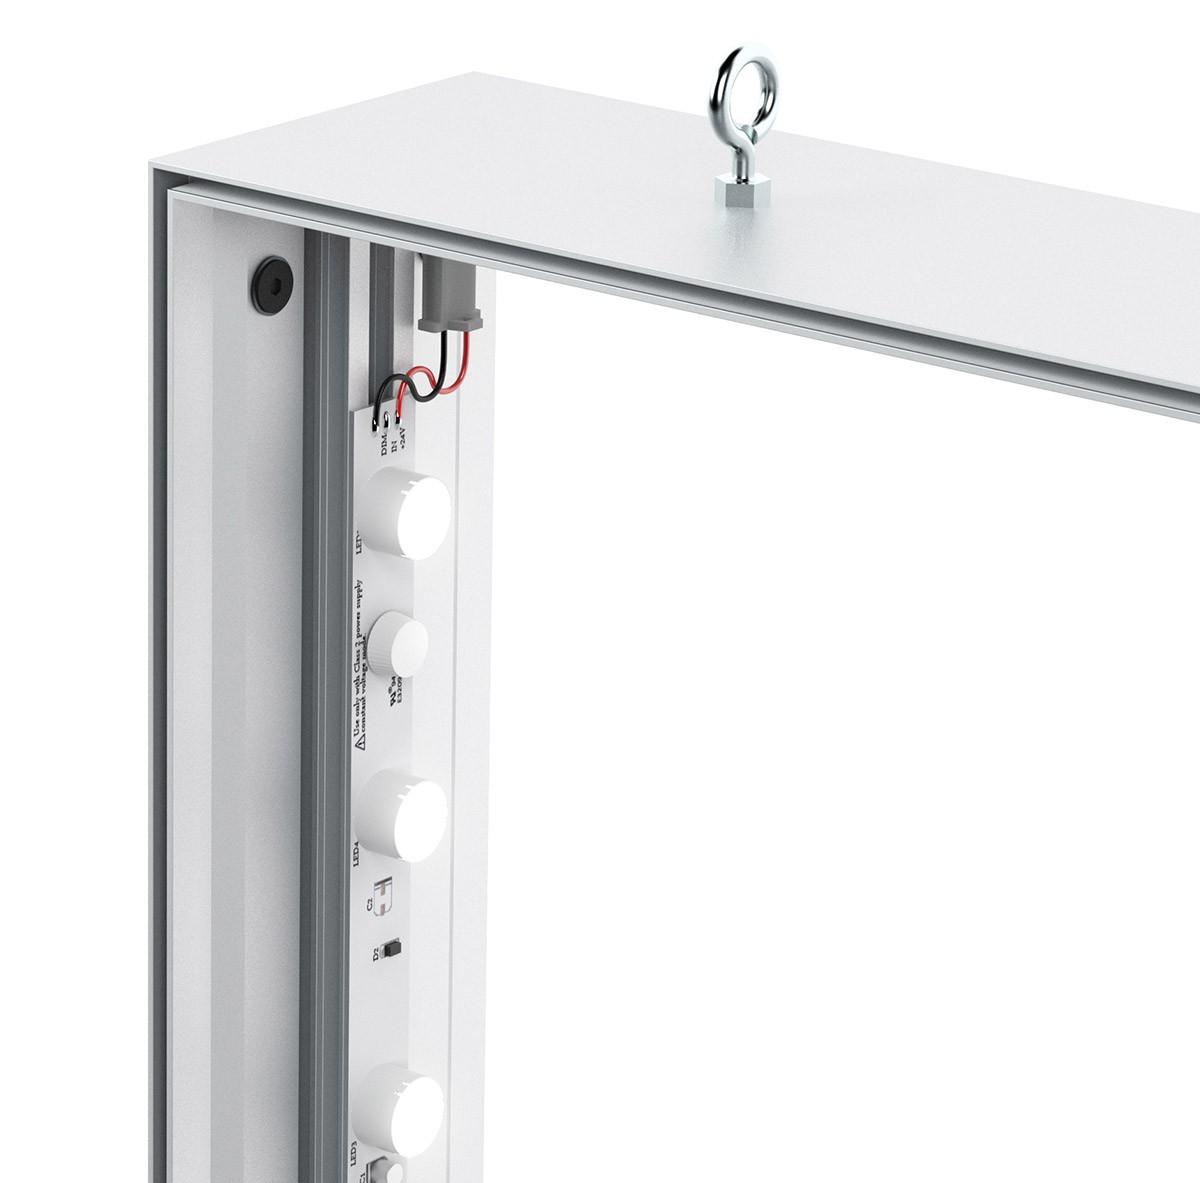 Charisma 72x108 Double Sided LED SEG Fabric Light Box